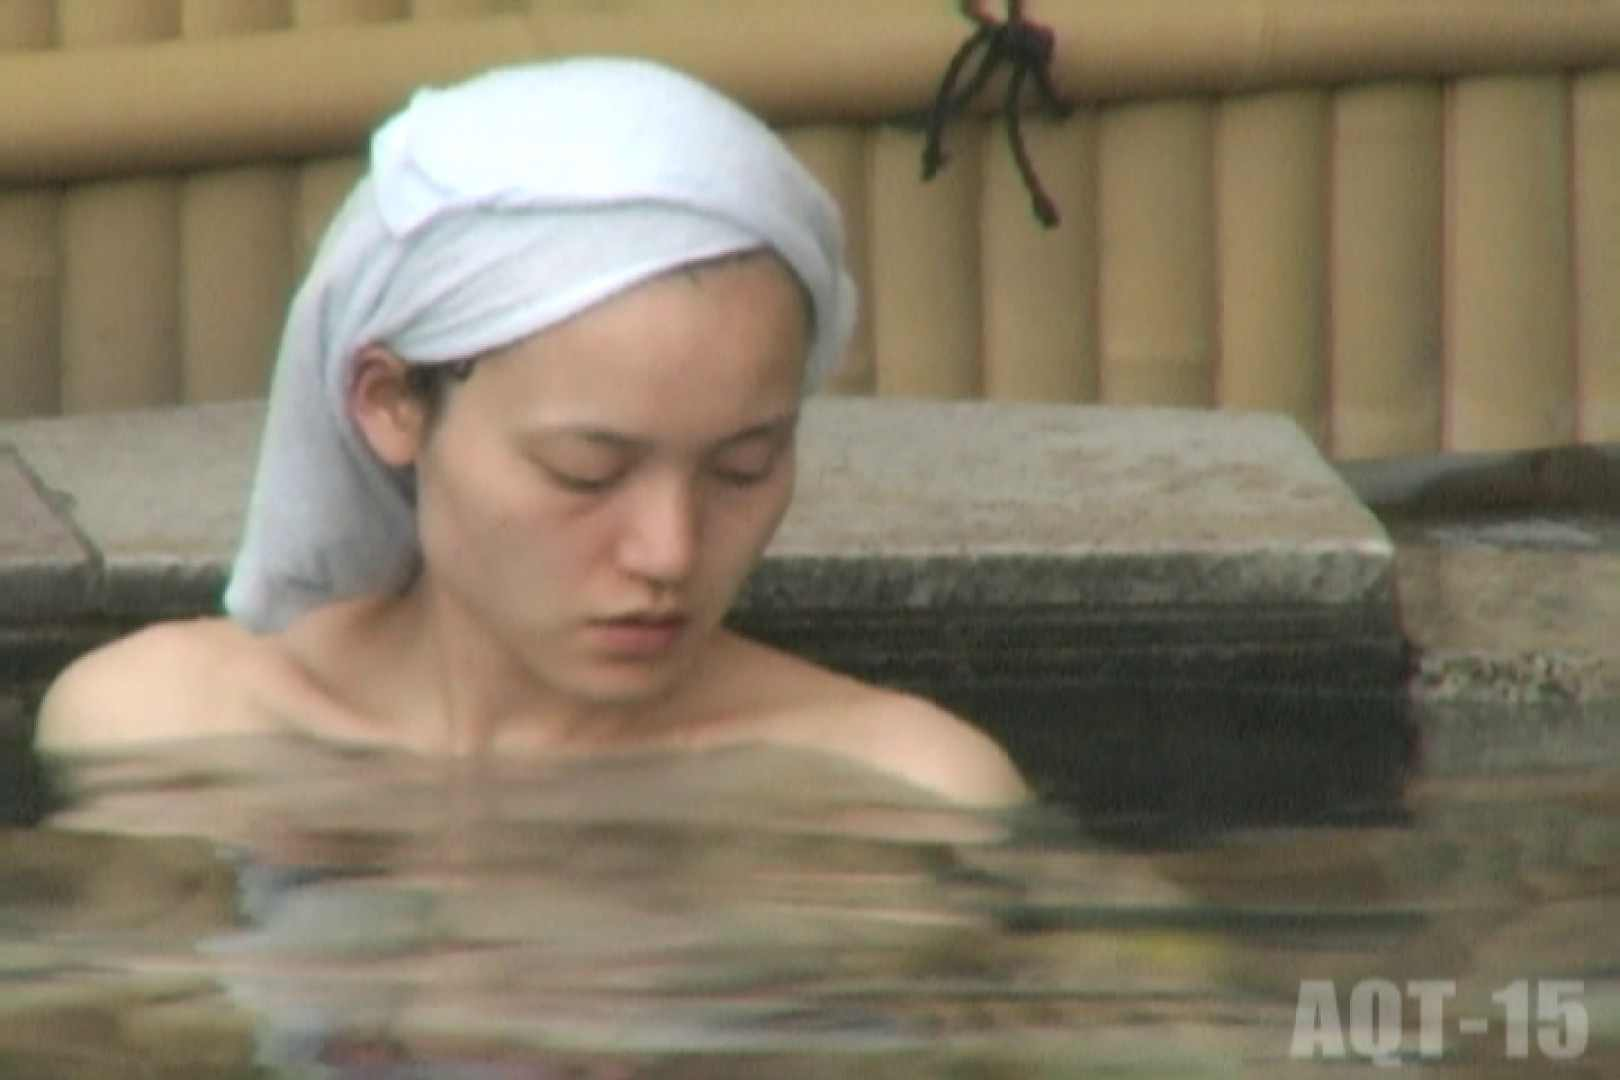 Aquaな露天風呂Vol.836 女体盗撮 盗撮アダルト動画キャプチャ 98連発 74